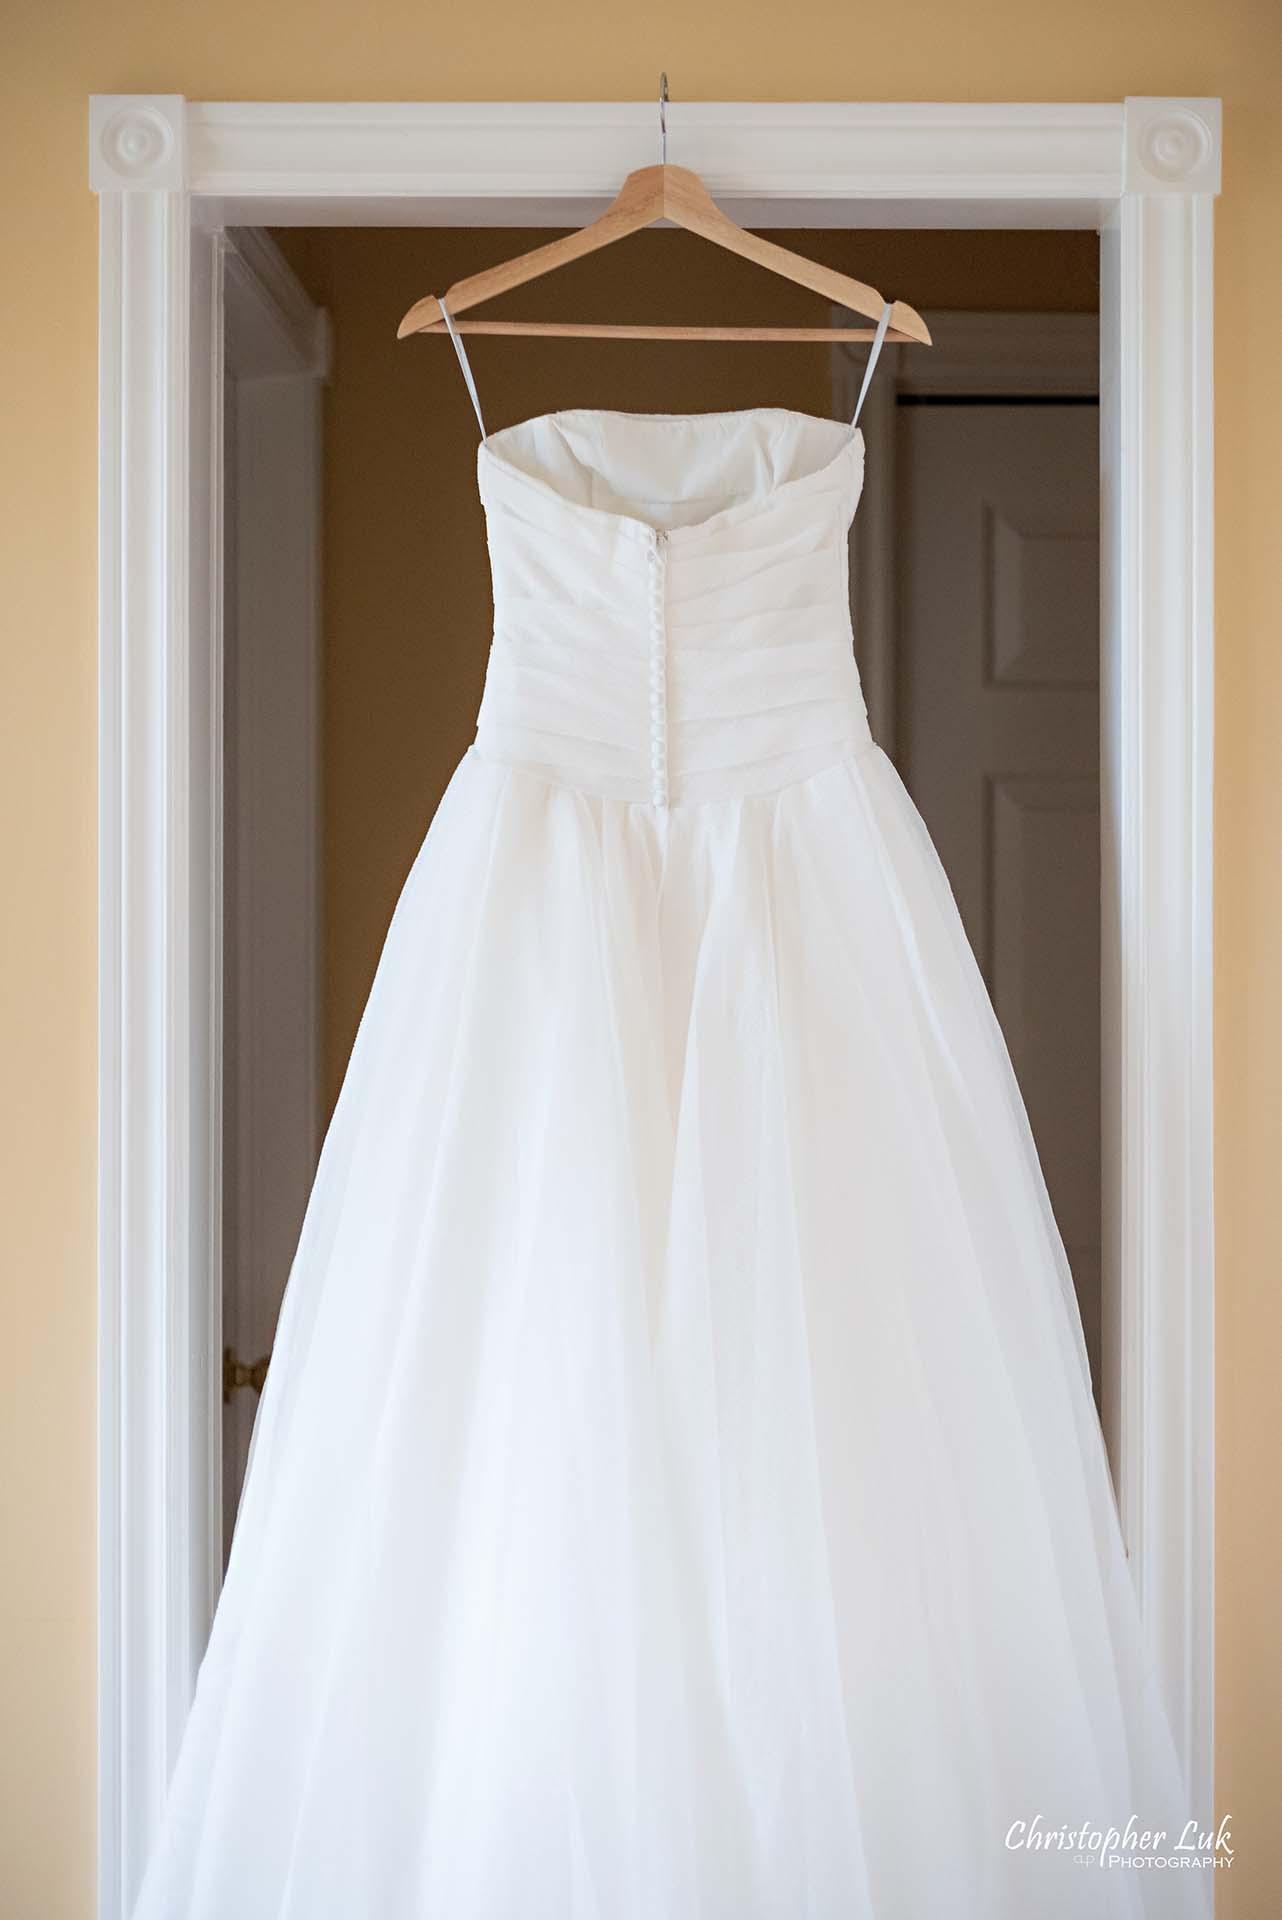 Christopher Luk Toronto Wedding Photographer Bride Getting Ready Preparations Bridal White Gown Dress Hanging Back Train Detail